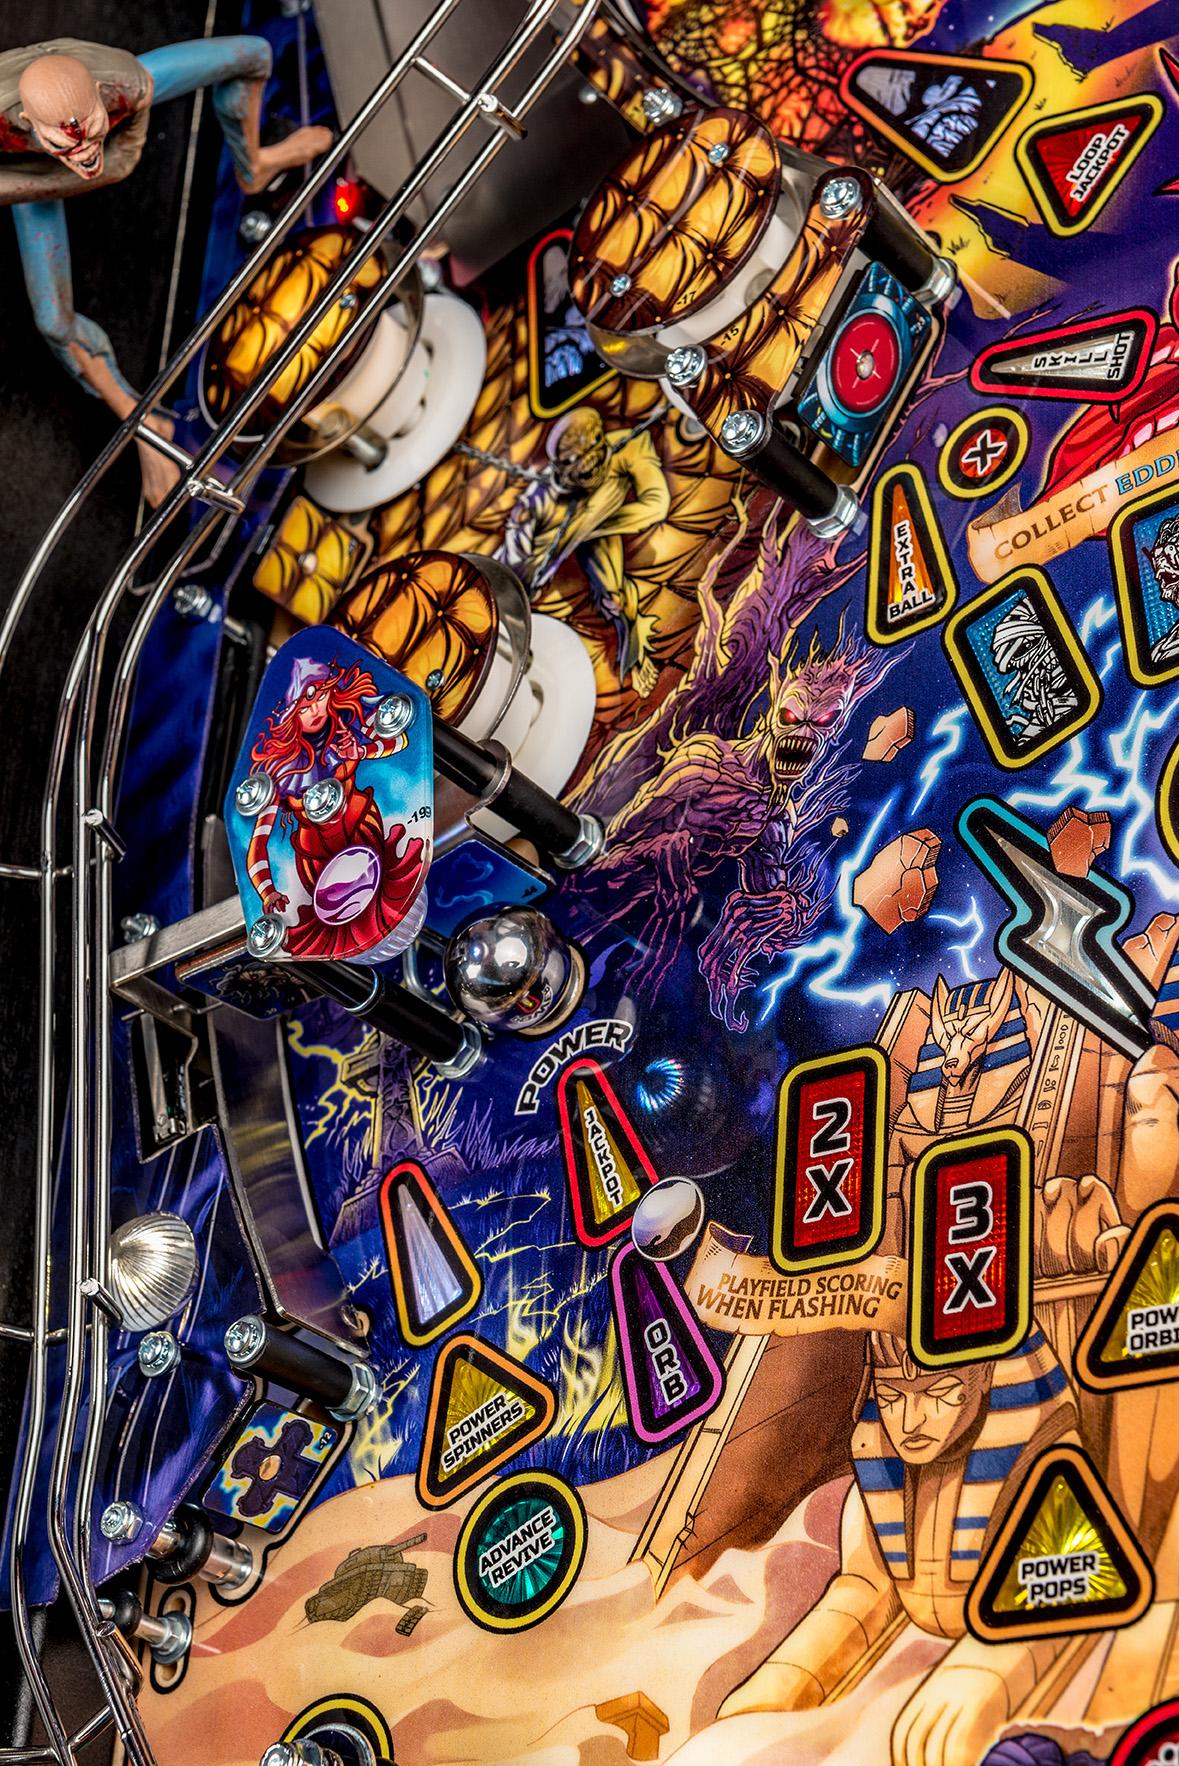 Iron-Maiden-Pinball-Machine-13a